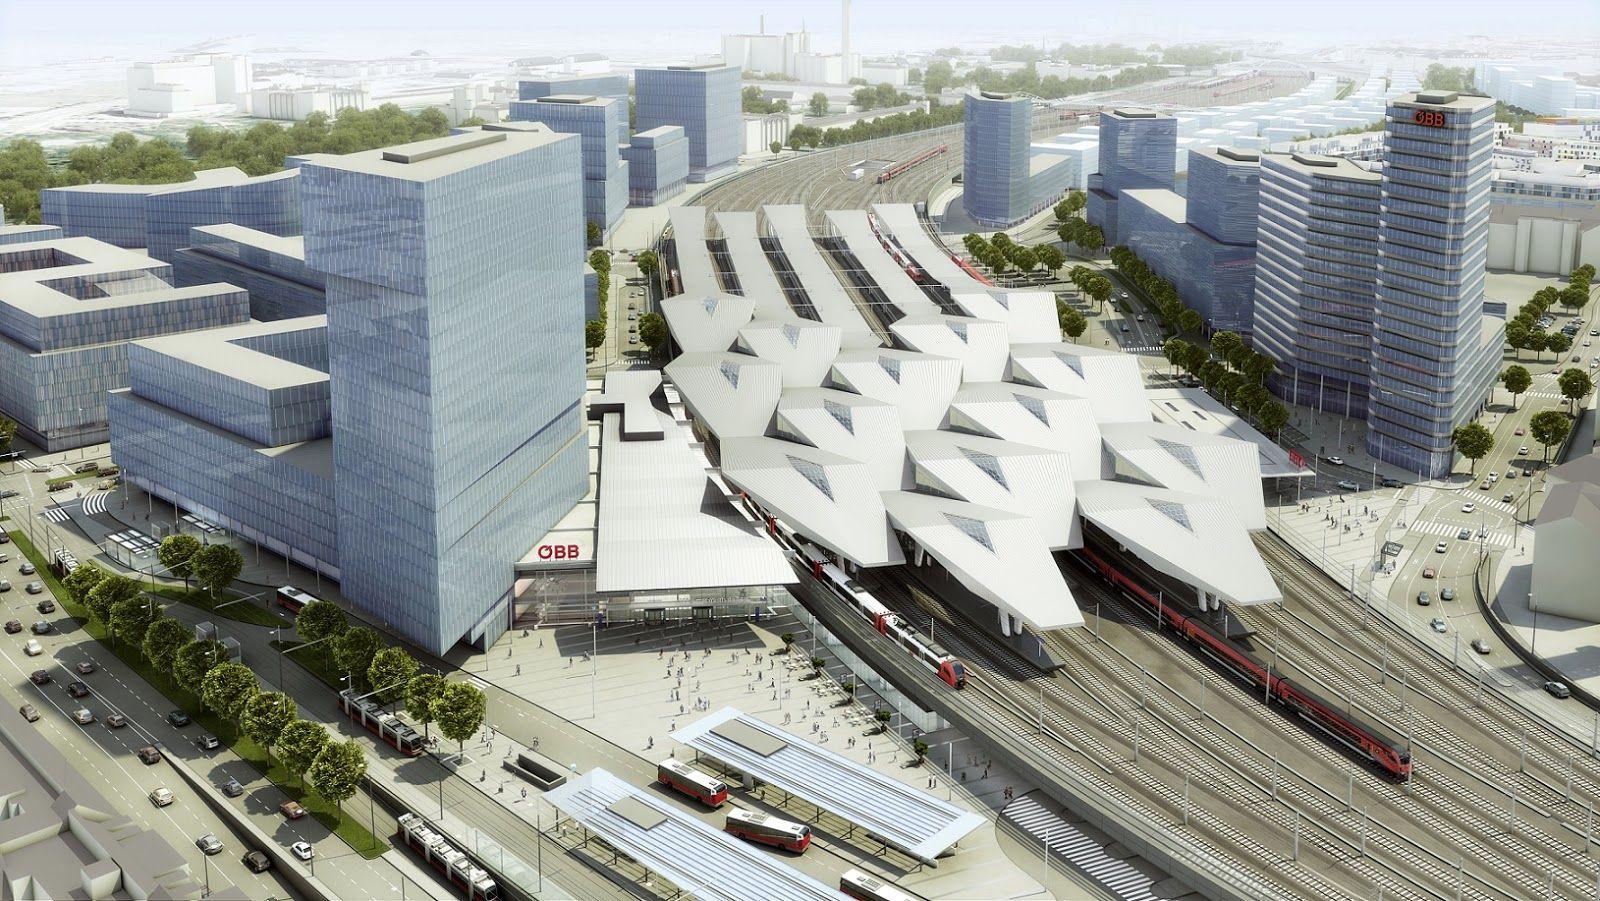 Vienna Hauptbahnhof (Main Train station) | Railway station, Vienna, Heart  of europe